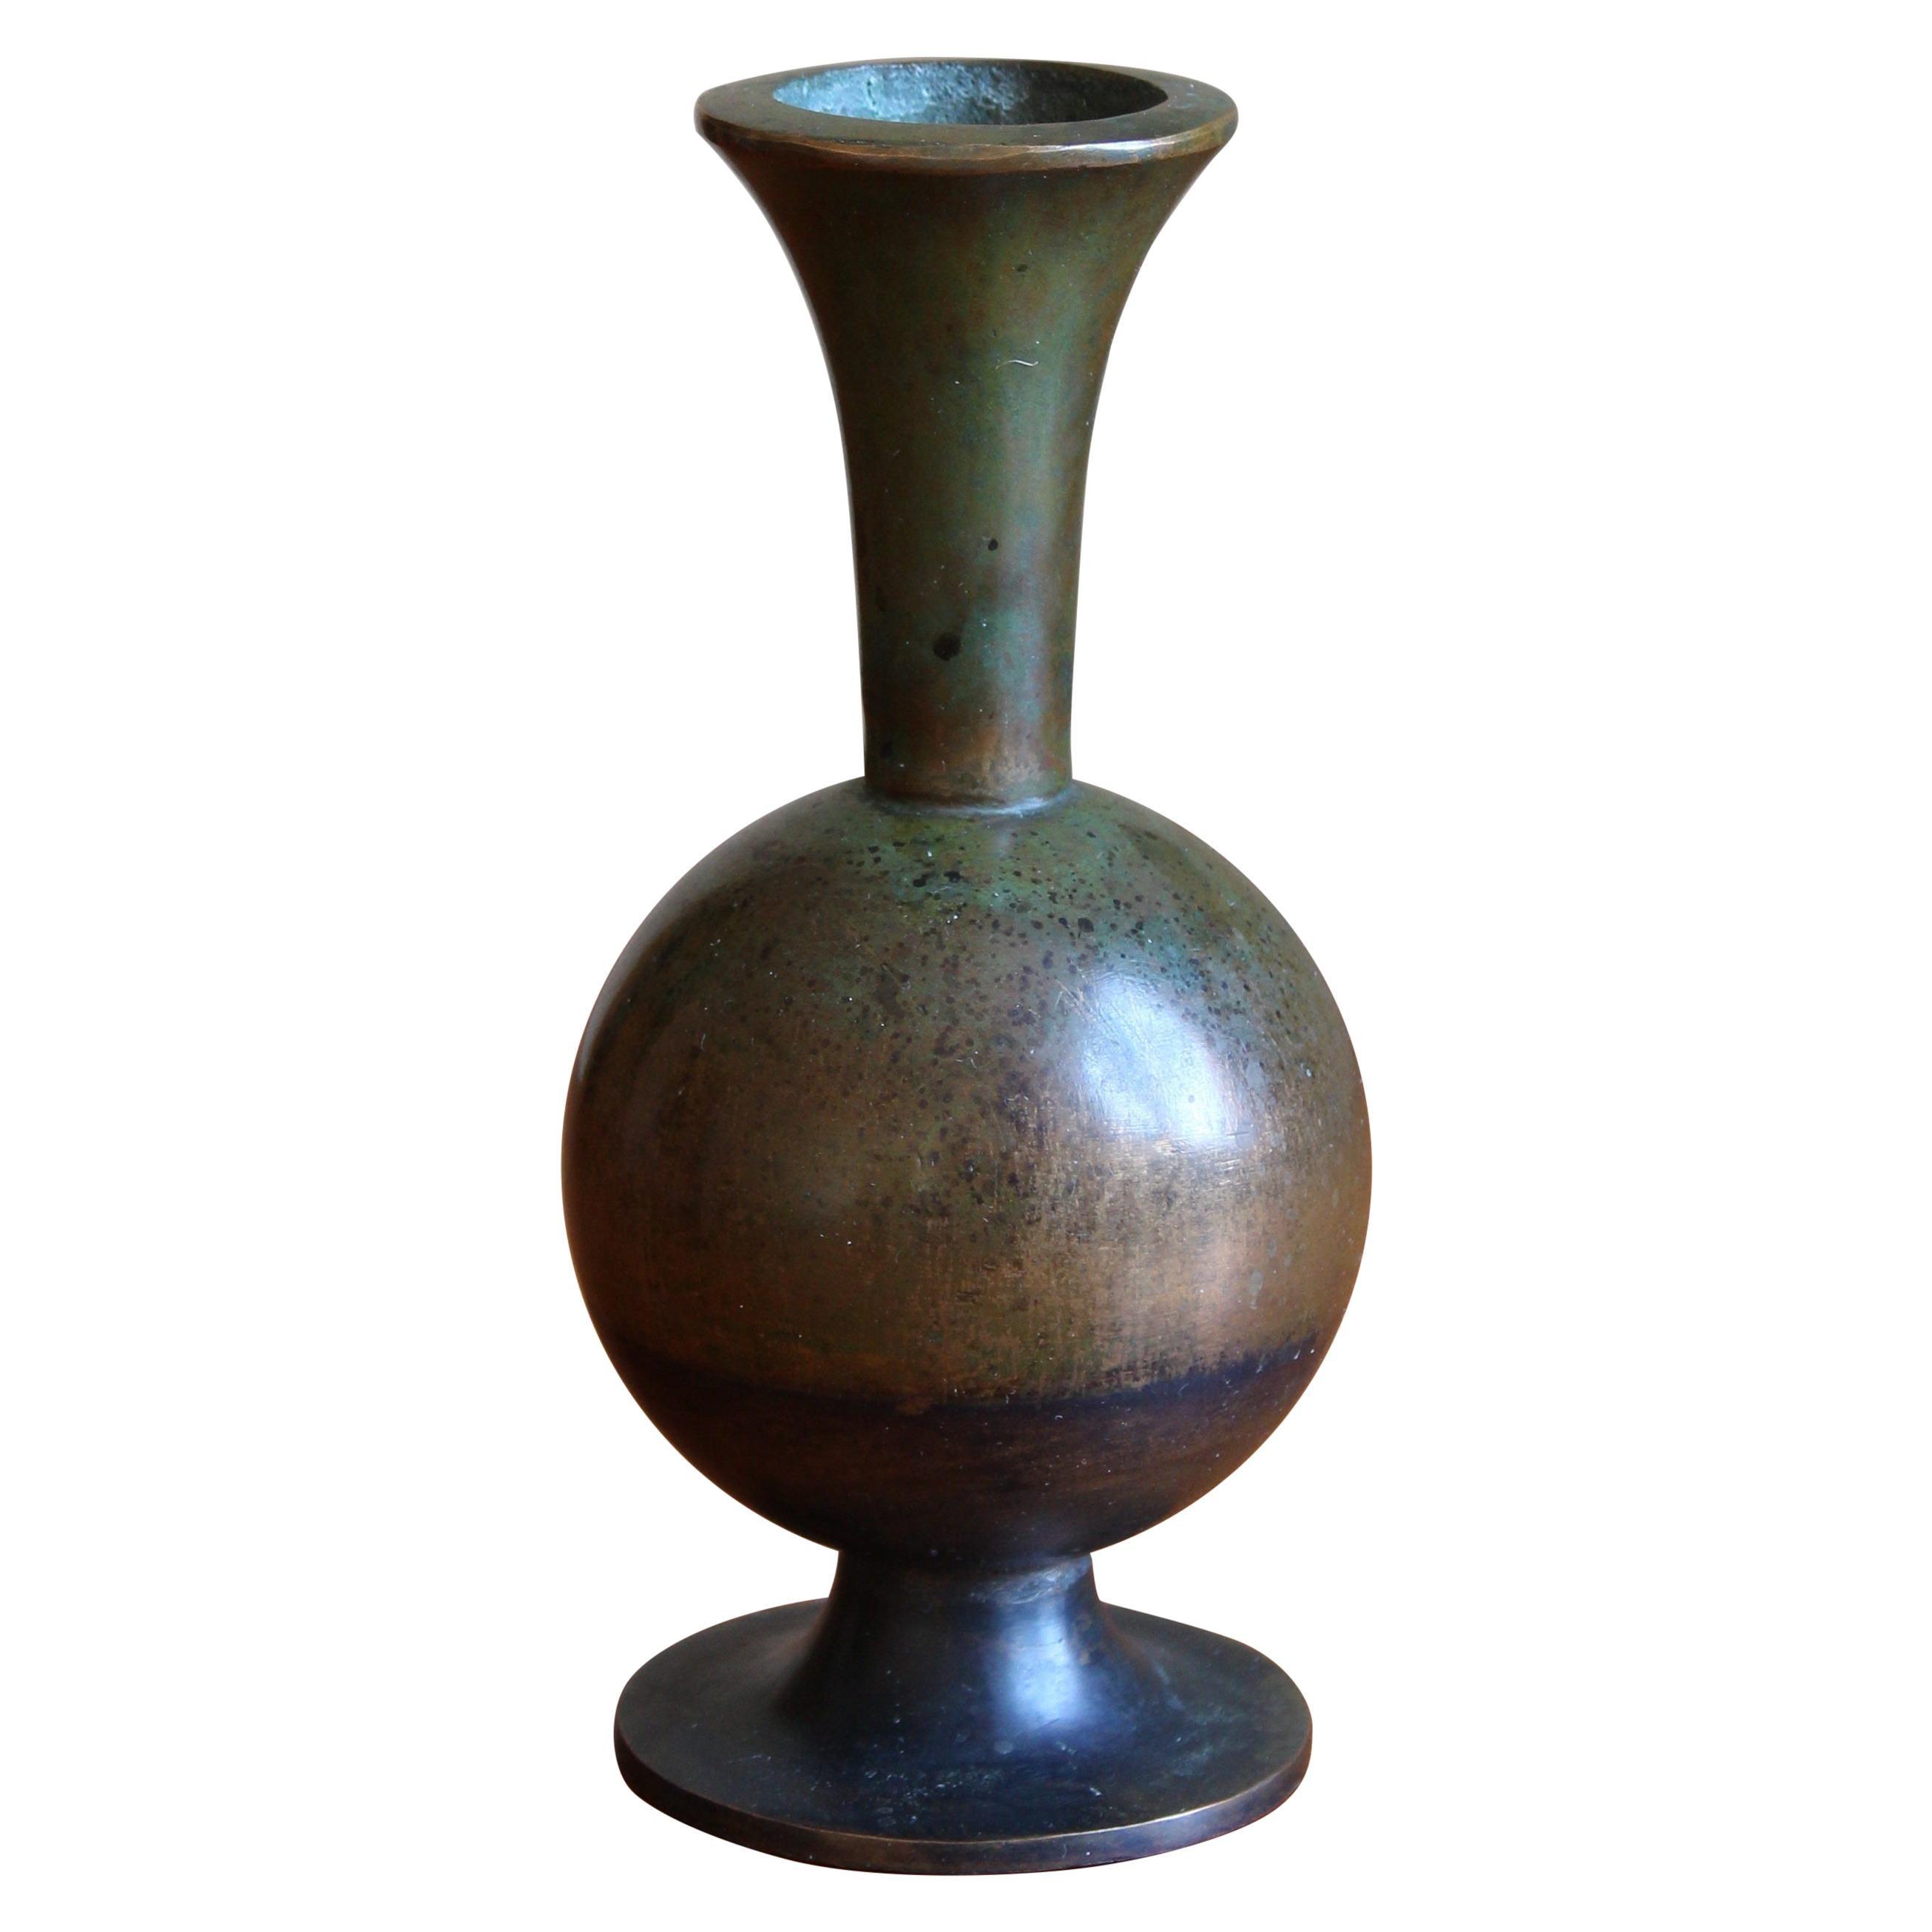 Sune Bäckström, Small Vase, Patinated Bronze, Sweden, 1930s